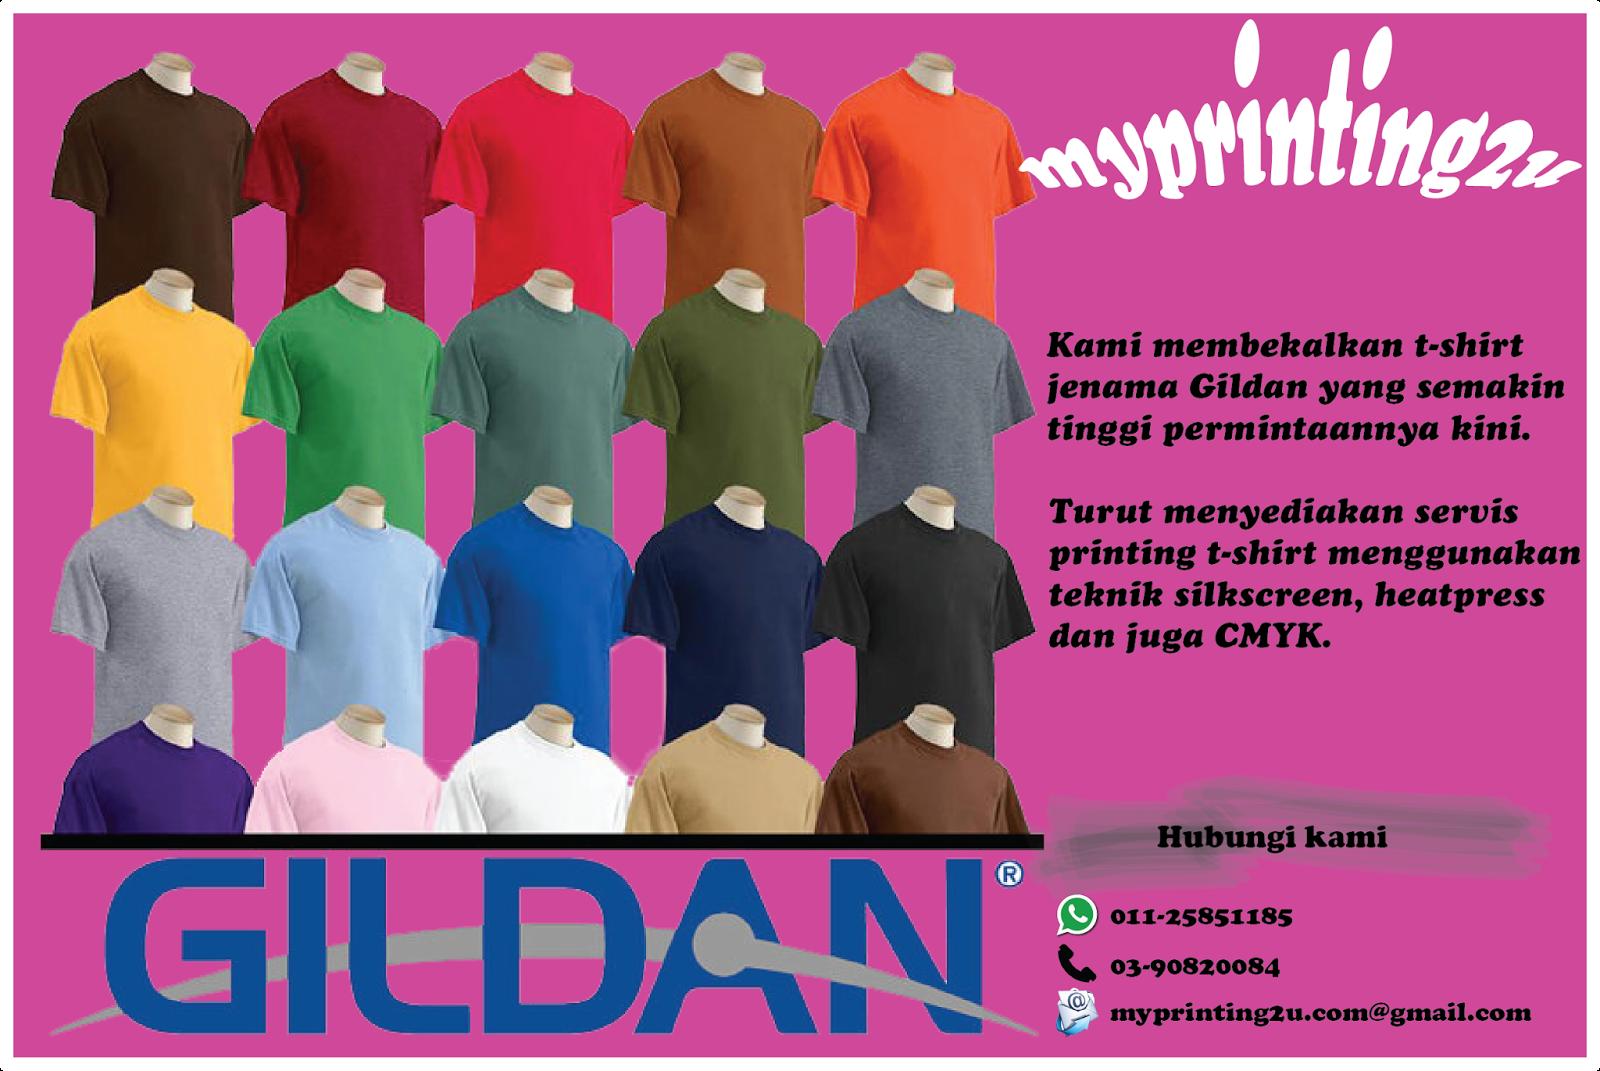 Gildan Tshirt at My printing2u